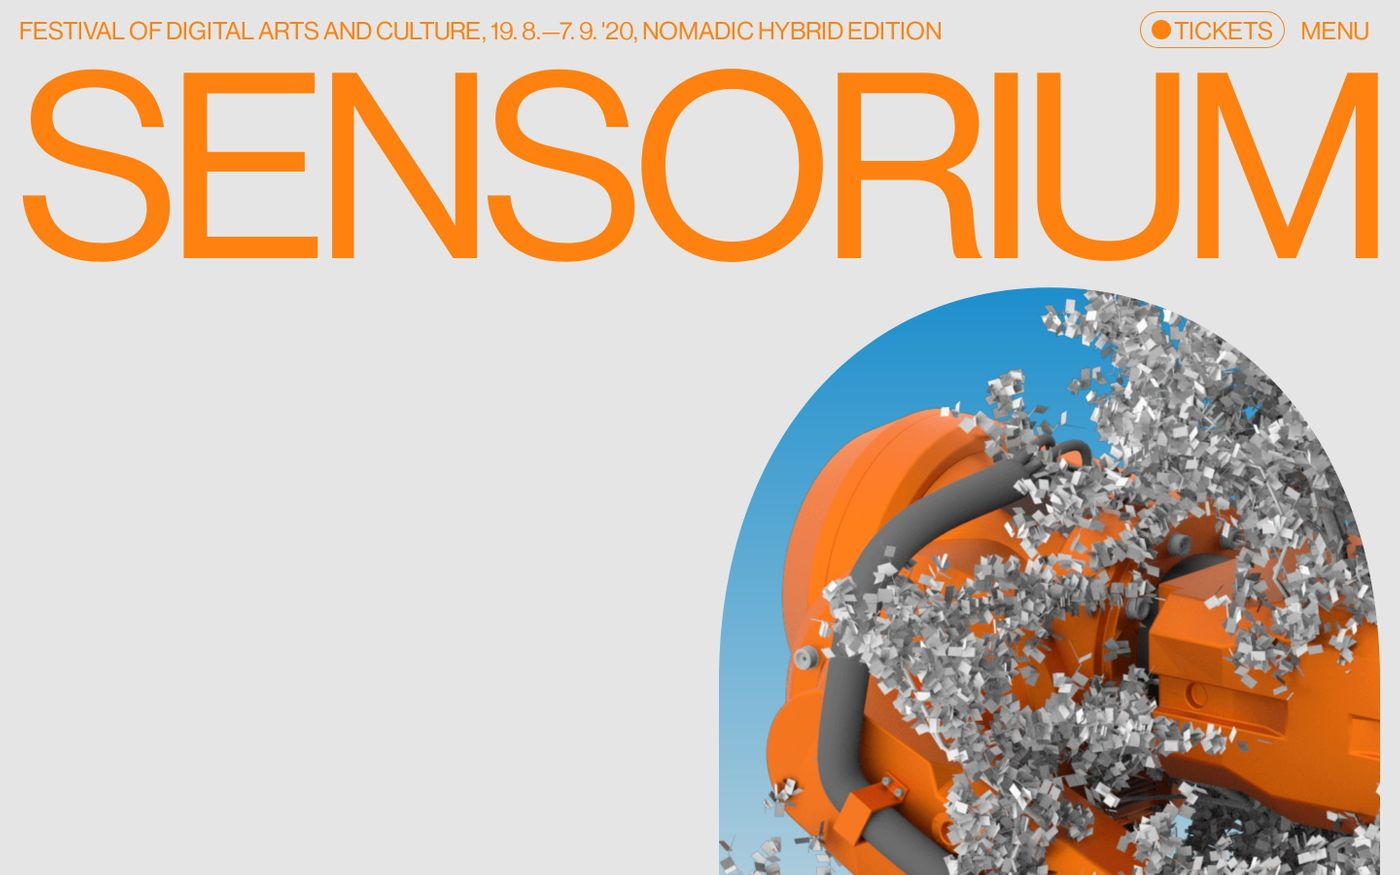 Screenshot of Sensorium Festival 2020 website